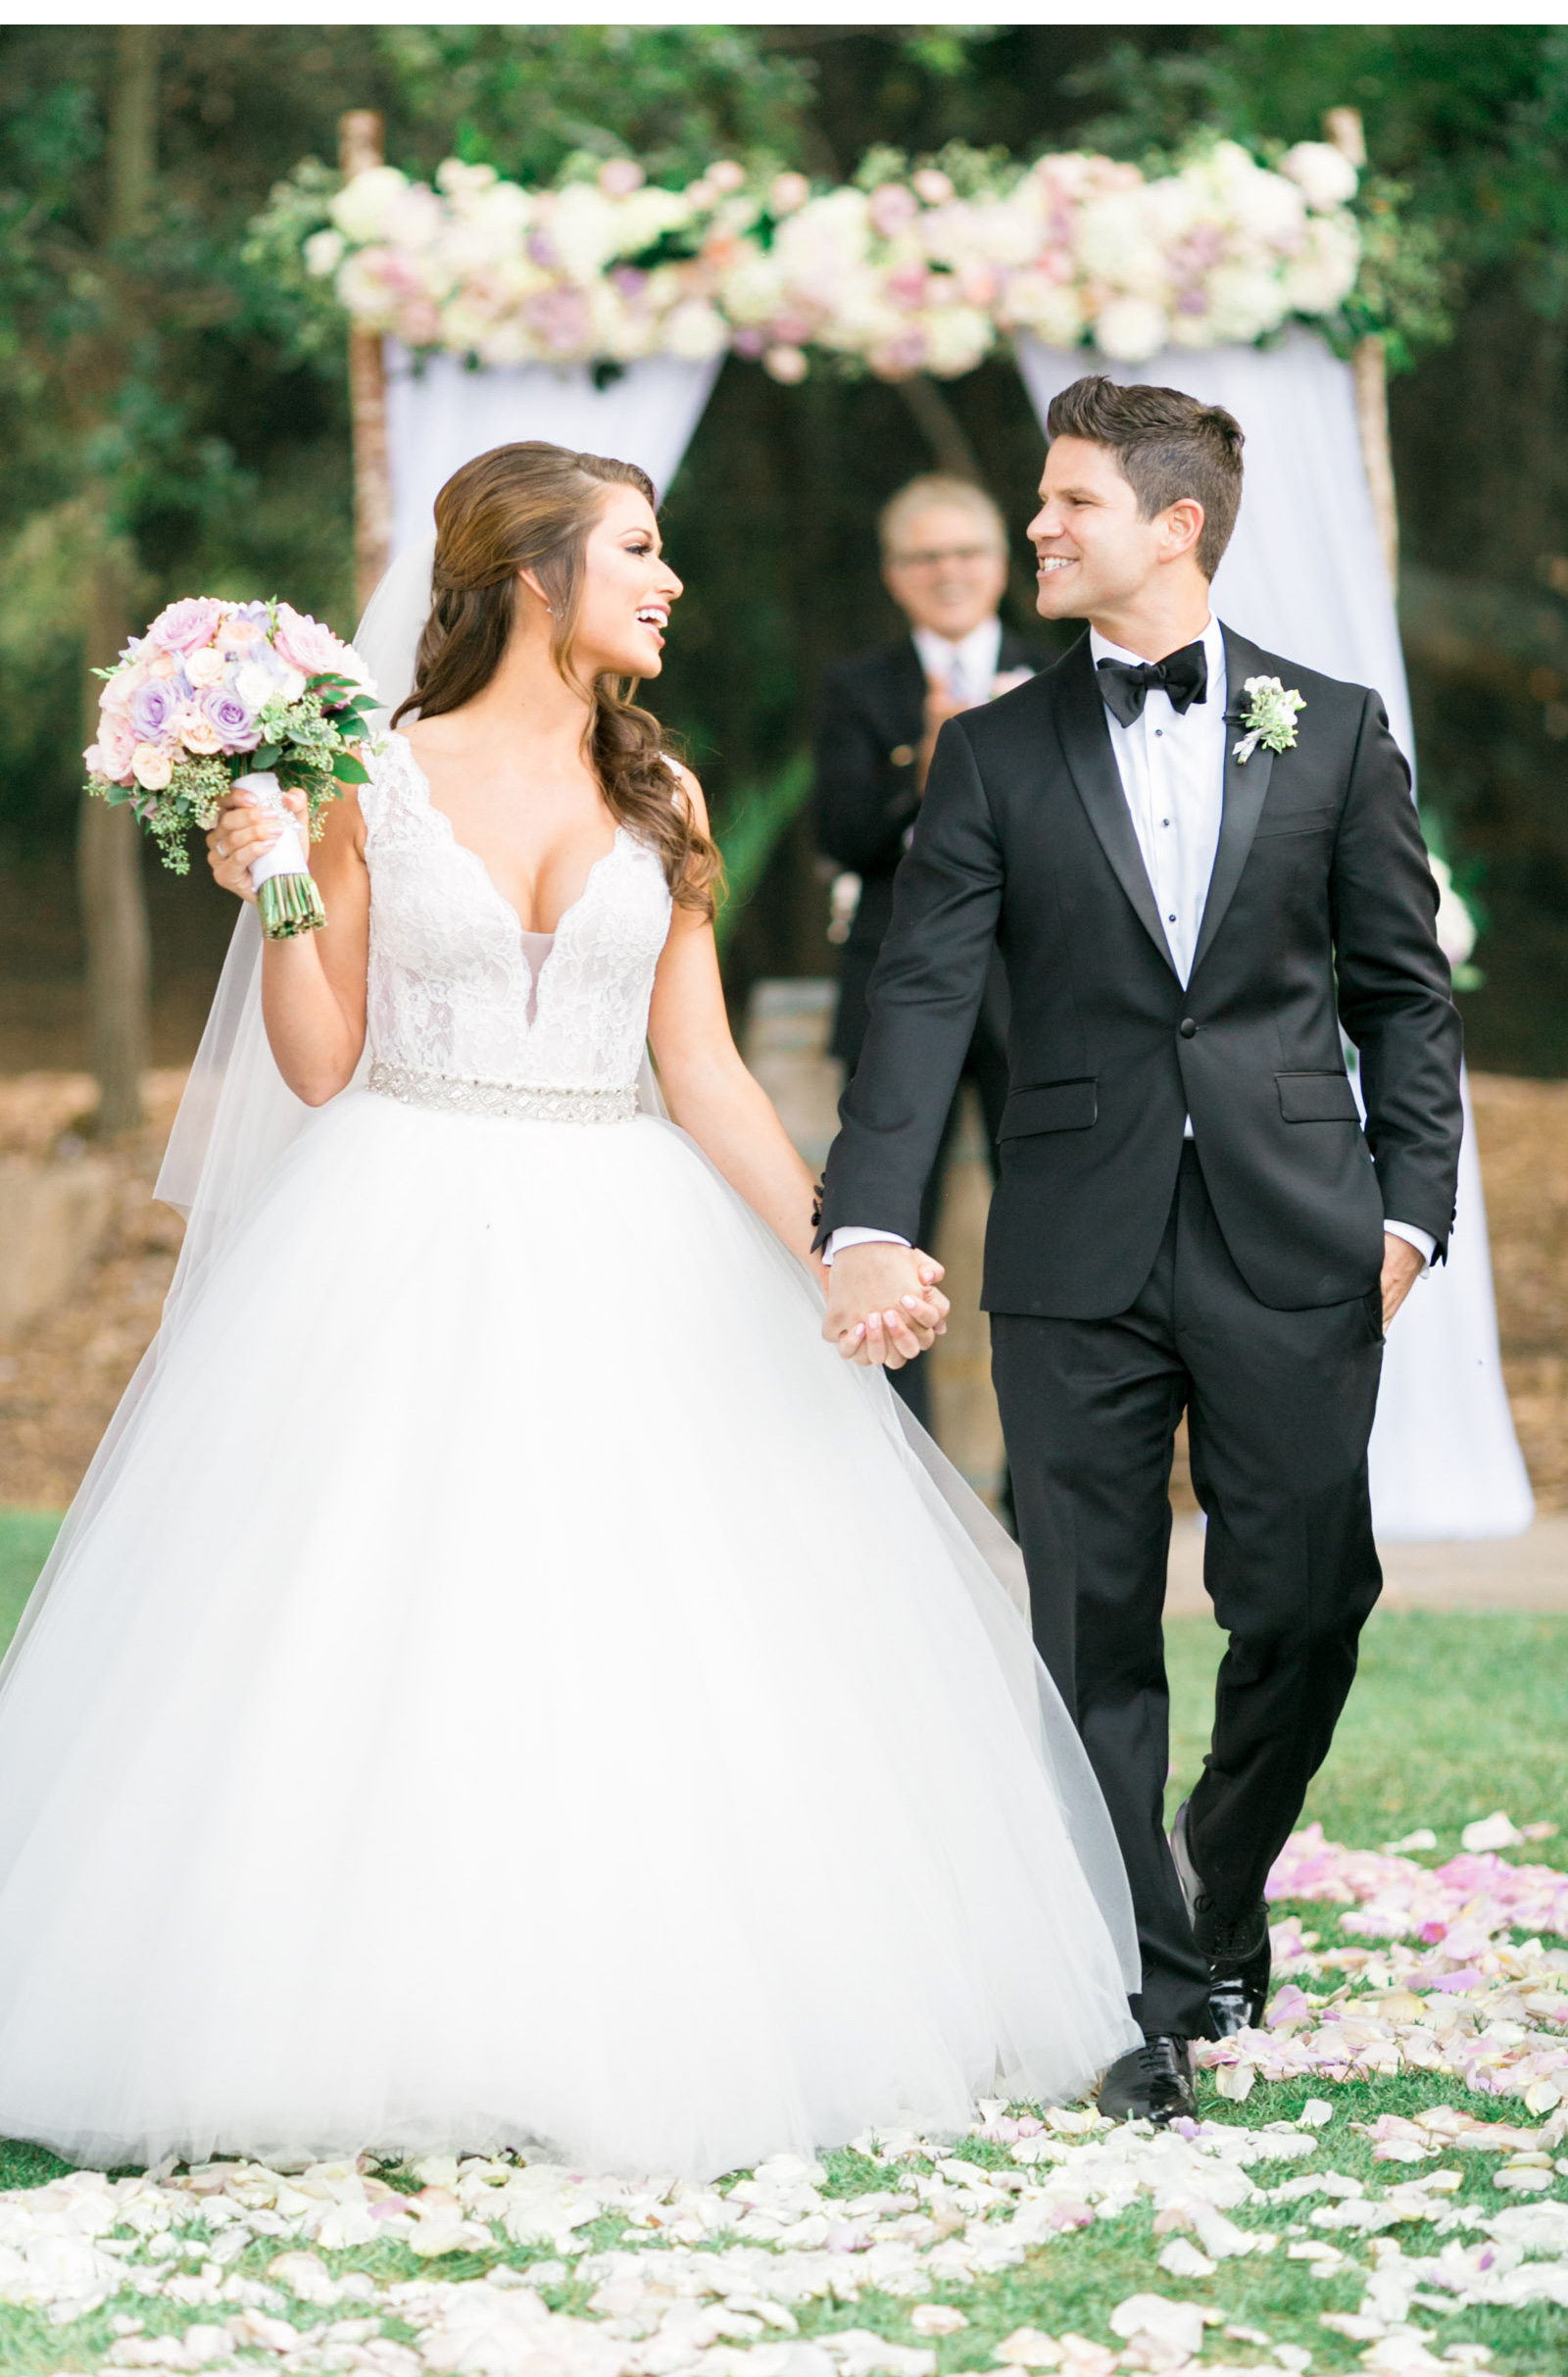 Daniel-&-Nia-Sanchez-Miss-USA-Wedding-Natalie-Schutt-Photography_01.jpg